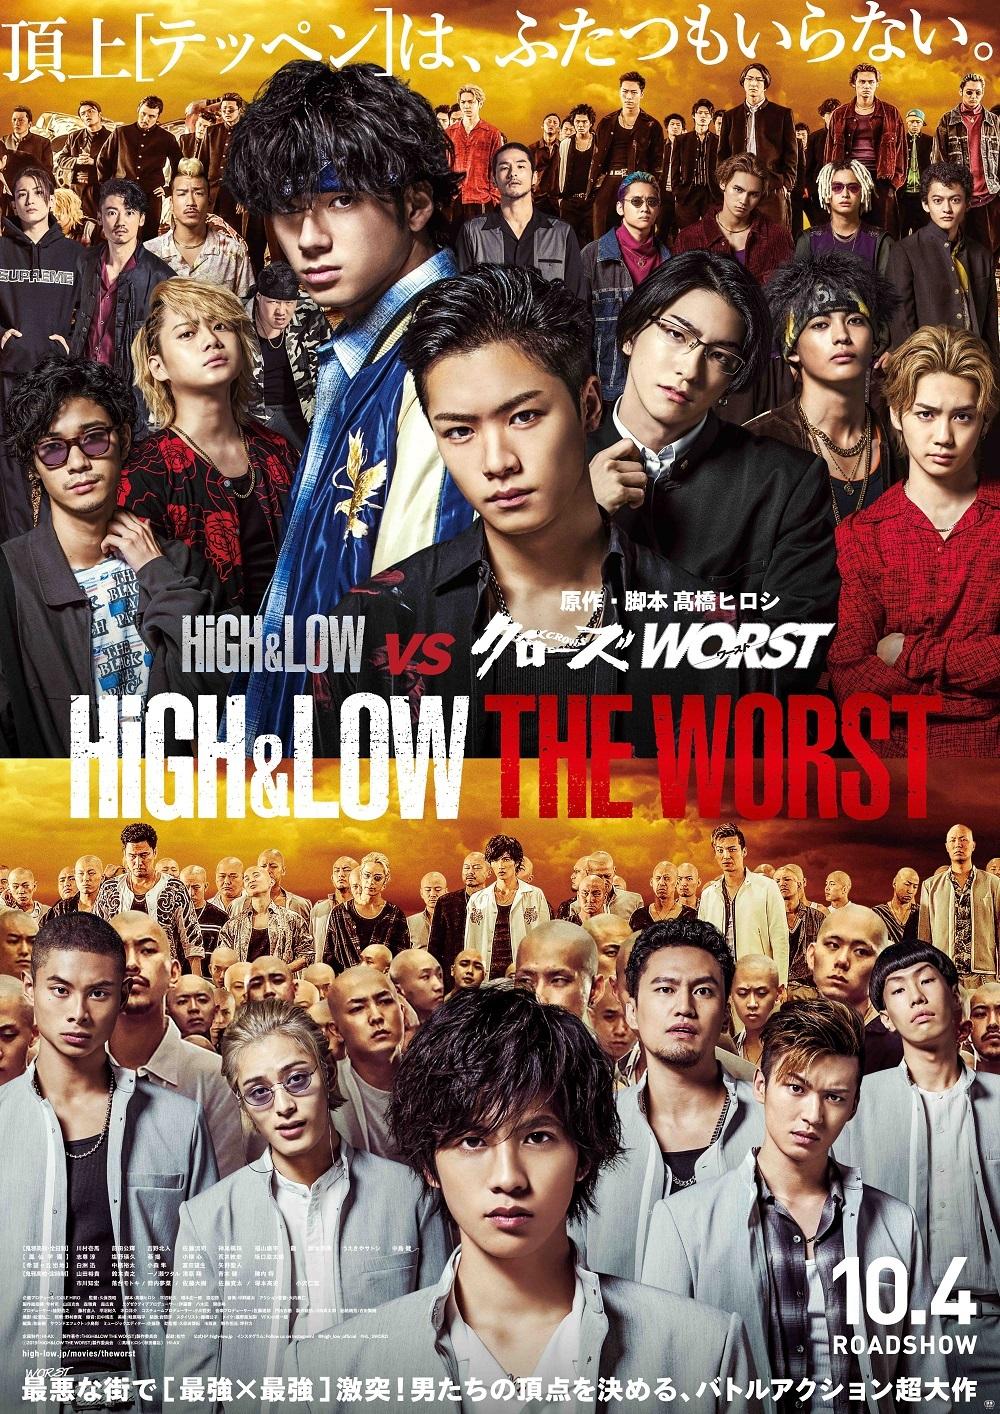 (C)2019「HiGH&LOW THE WORST」製作委員会 (C)髙橋ヒロシ(秋田書店) HI-AX